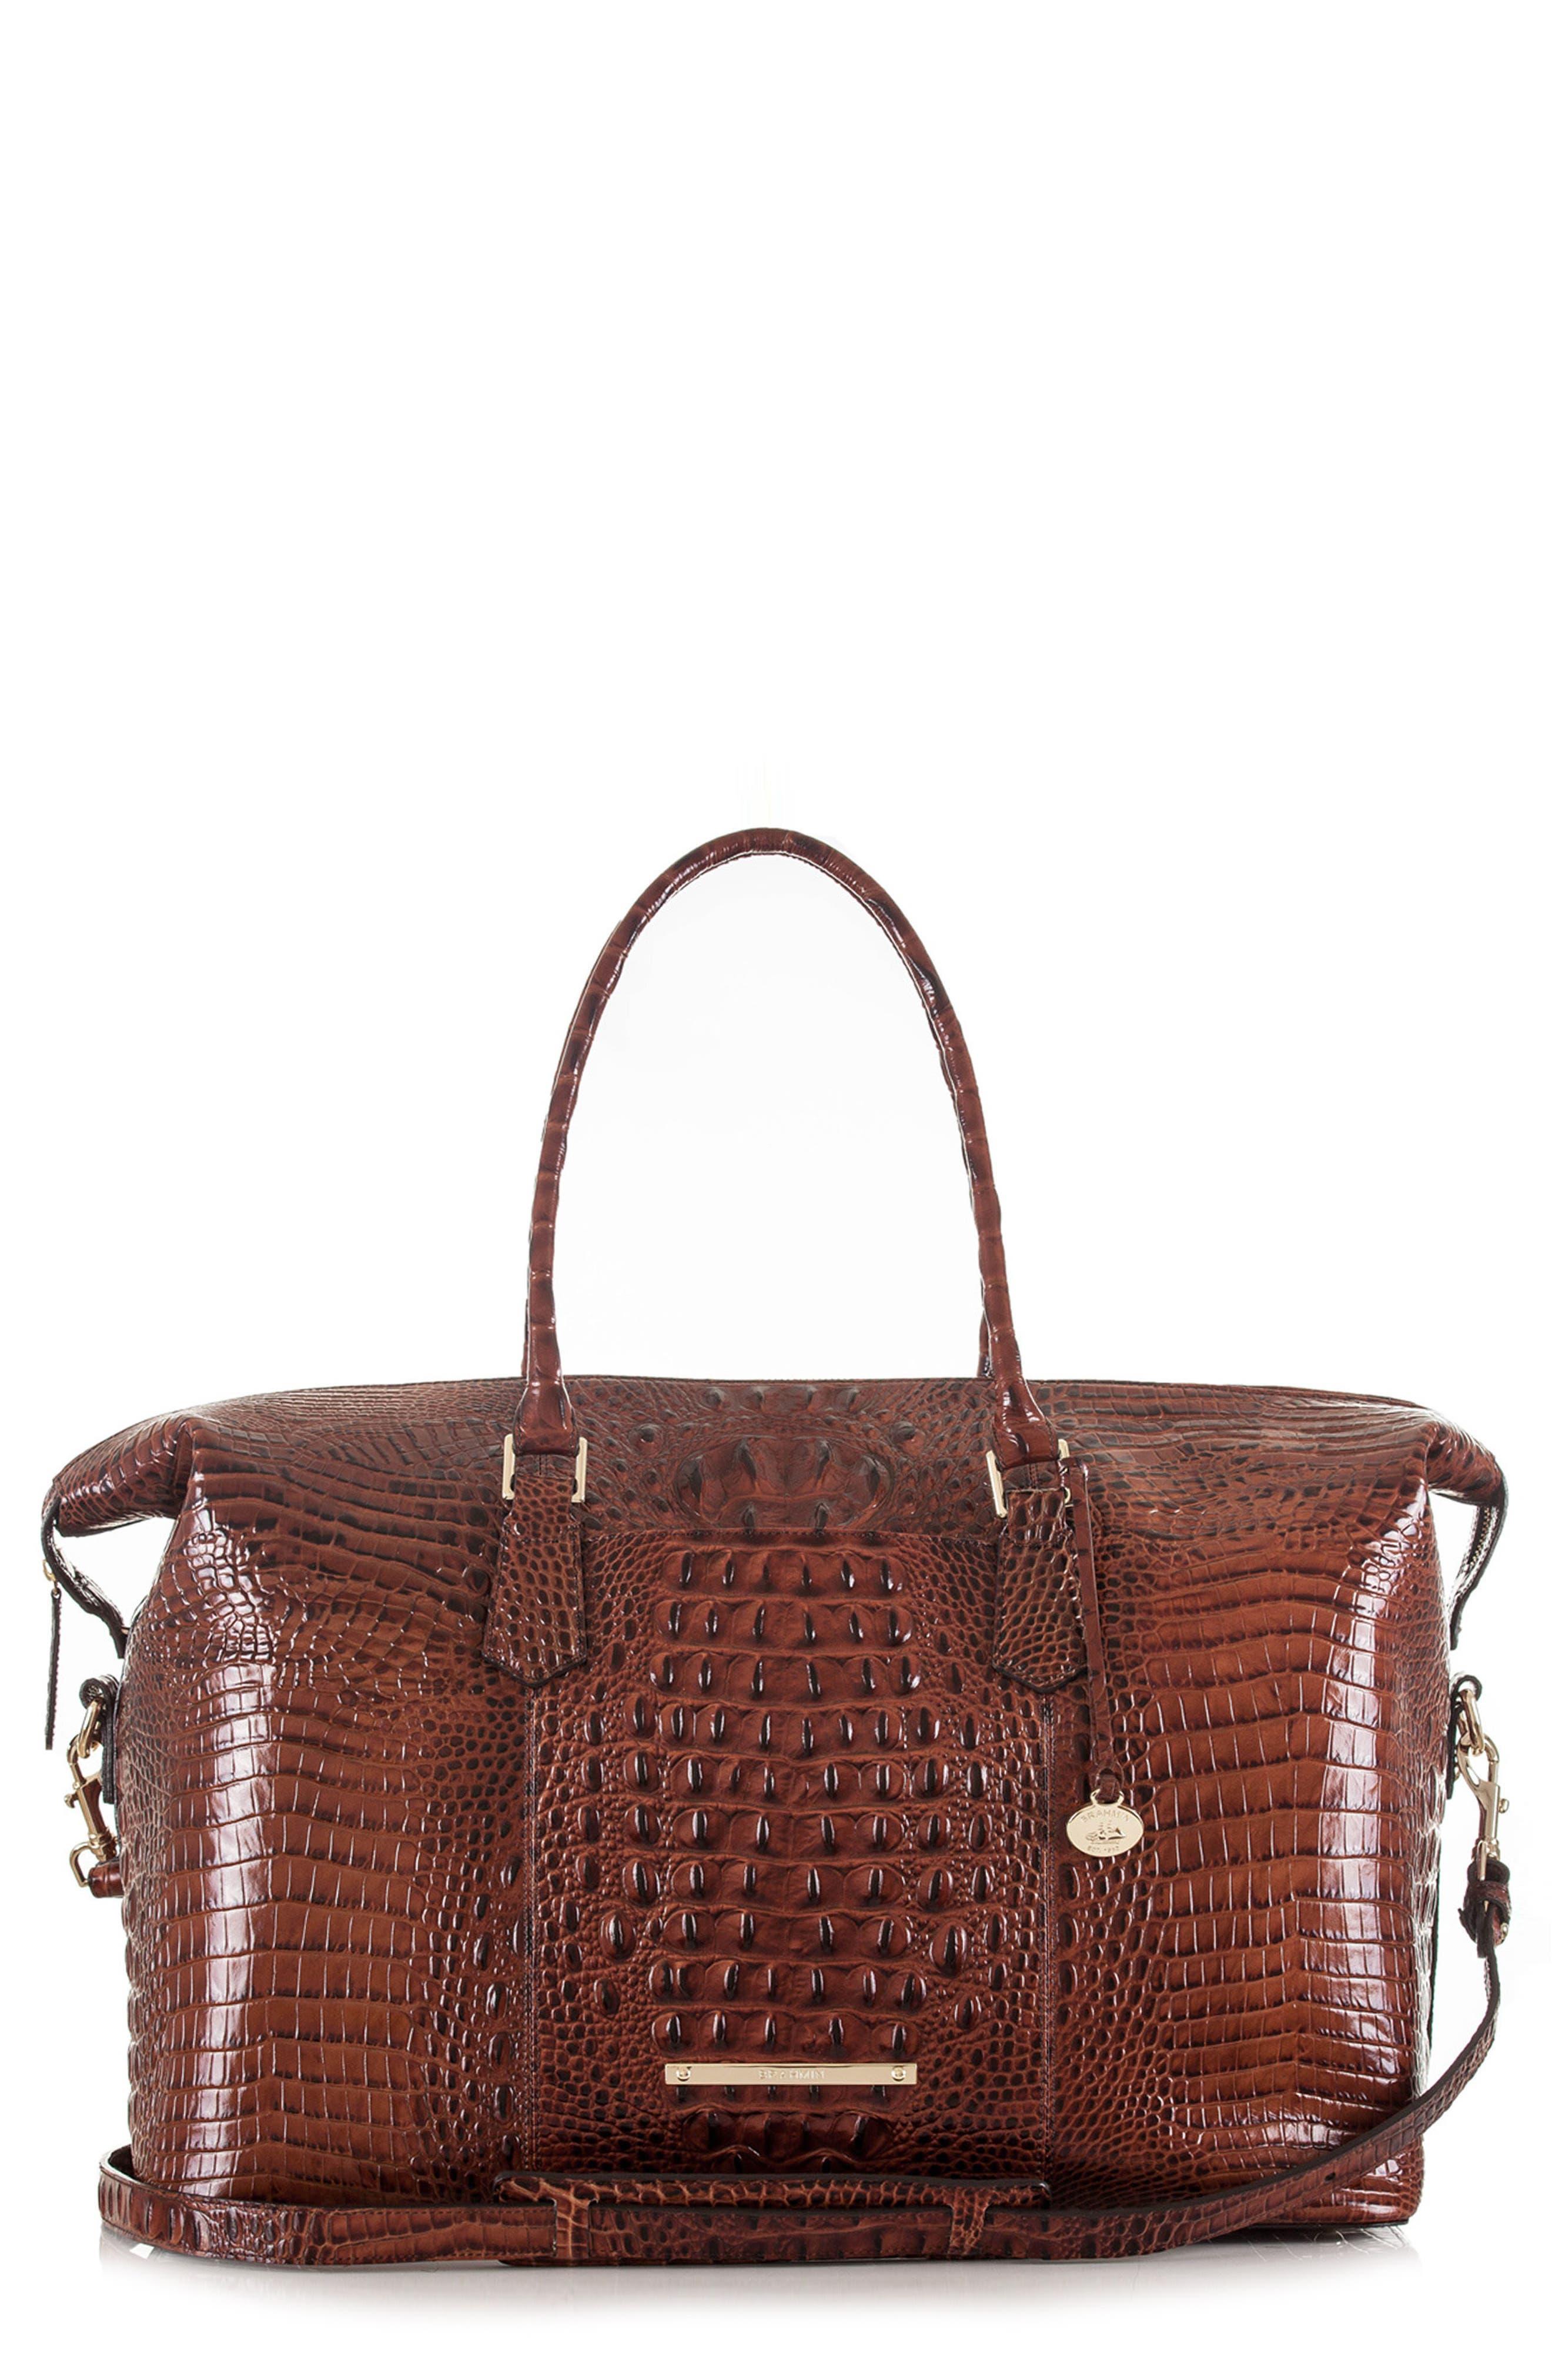 BRAHMIN Duxbury Leather Travel Bag